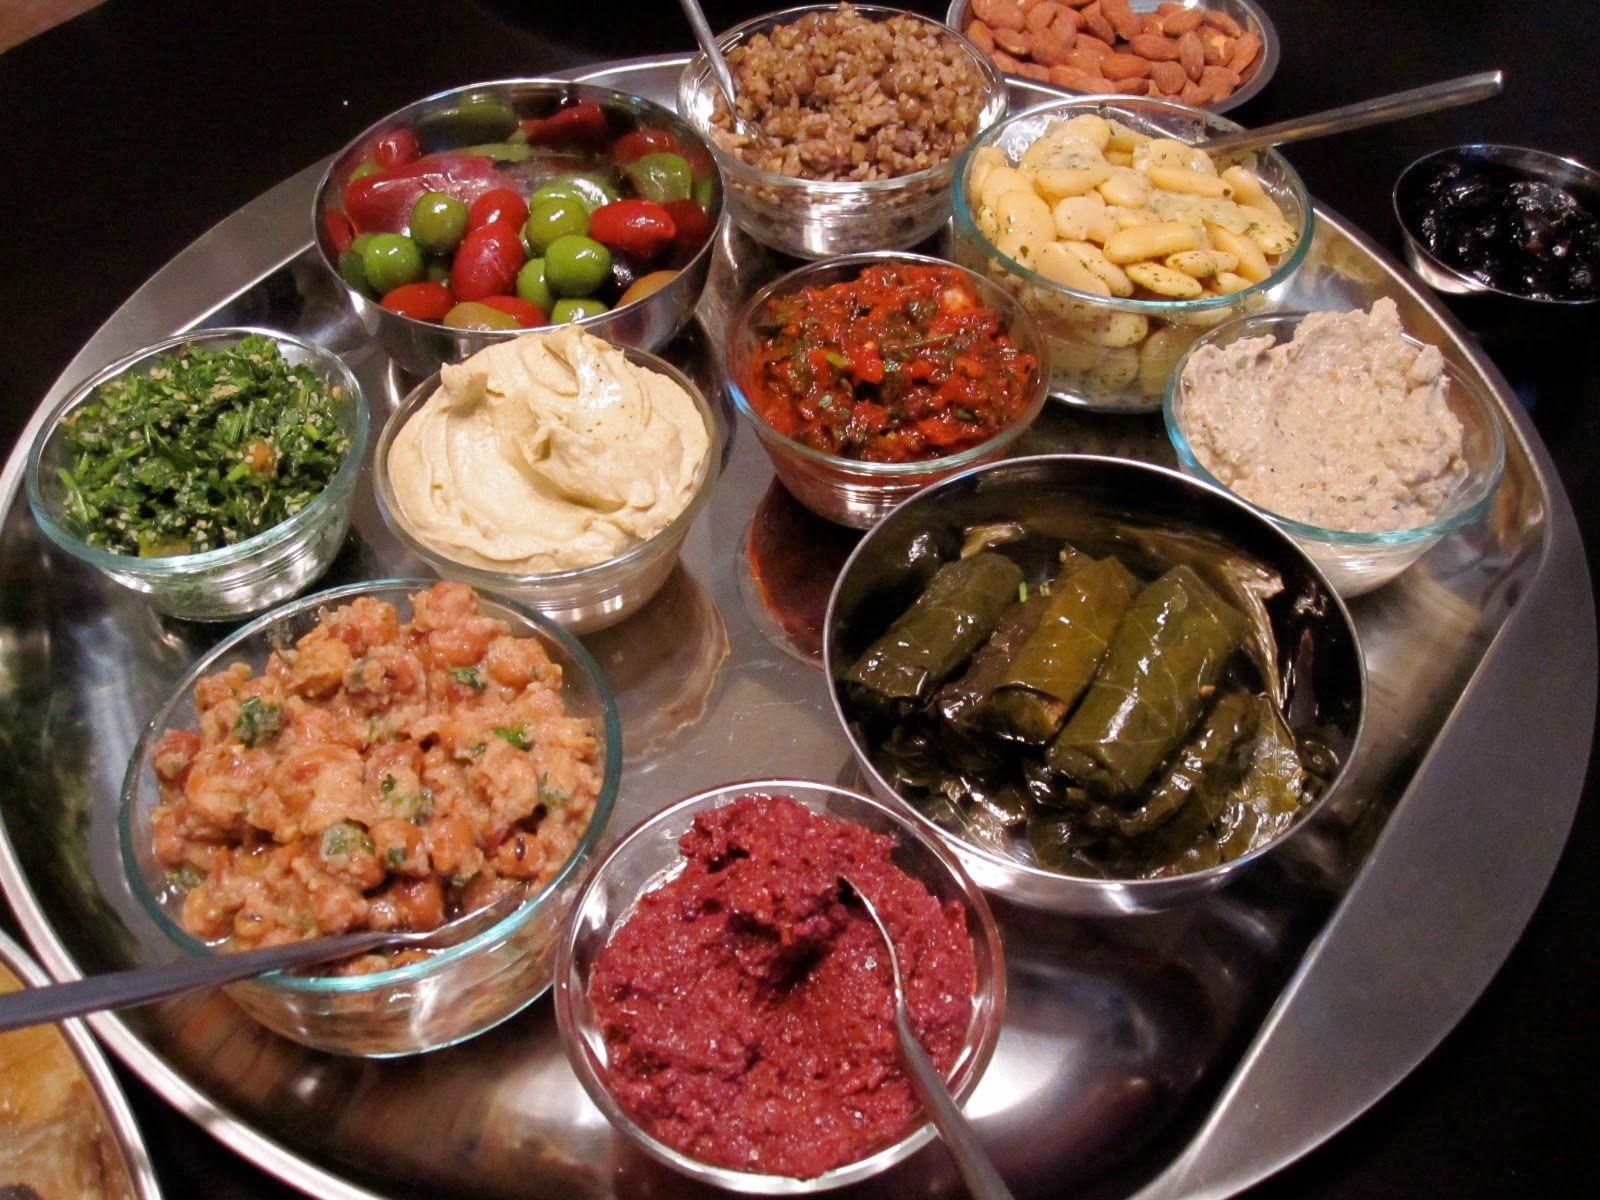 Superb Turkish Dinner Party Ideas Part - 6: Arabian Nights Themed Party - Turkish Tapas/meze Board Starter